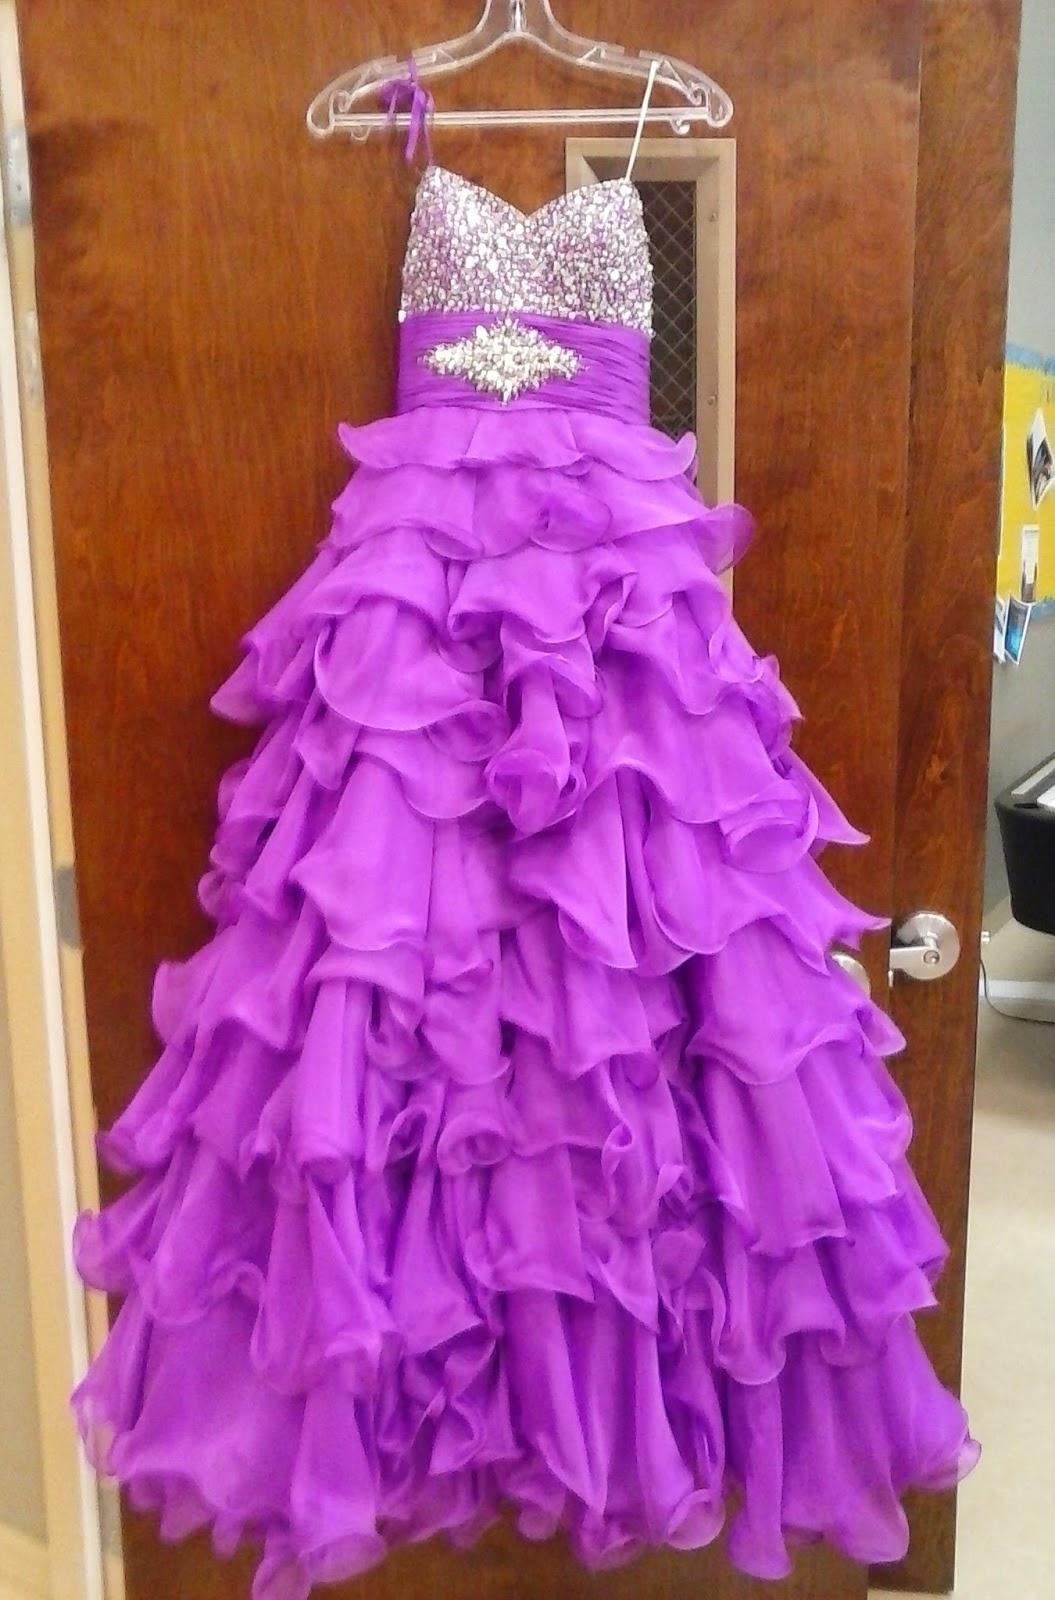 Nick Nicholas Ford Inverness >> Citrus Cinderellas : Cinderella's Closet Prom Dress Give ...